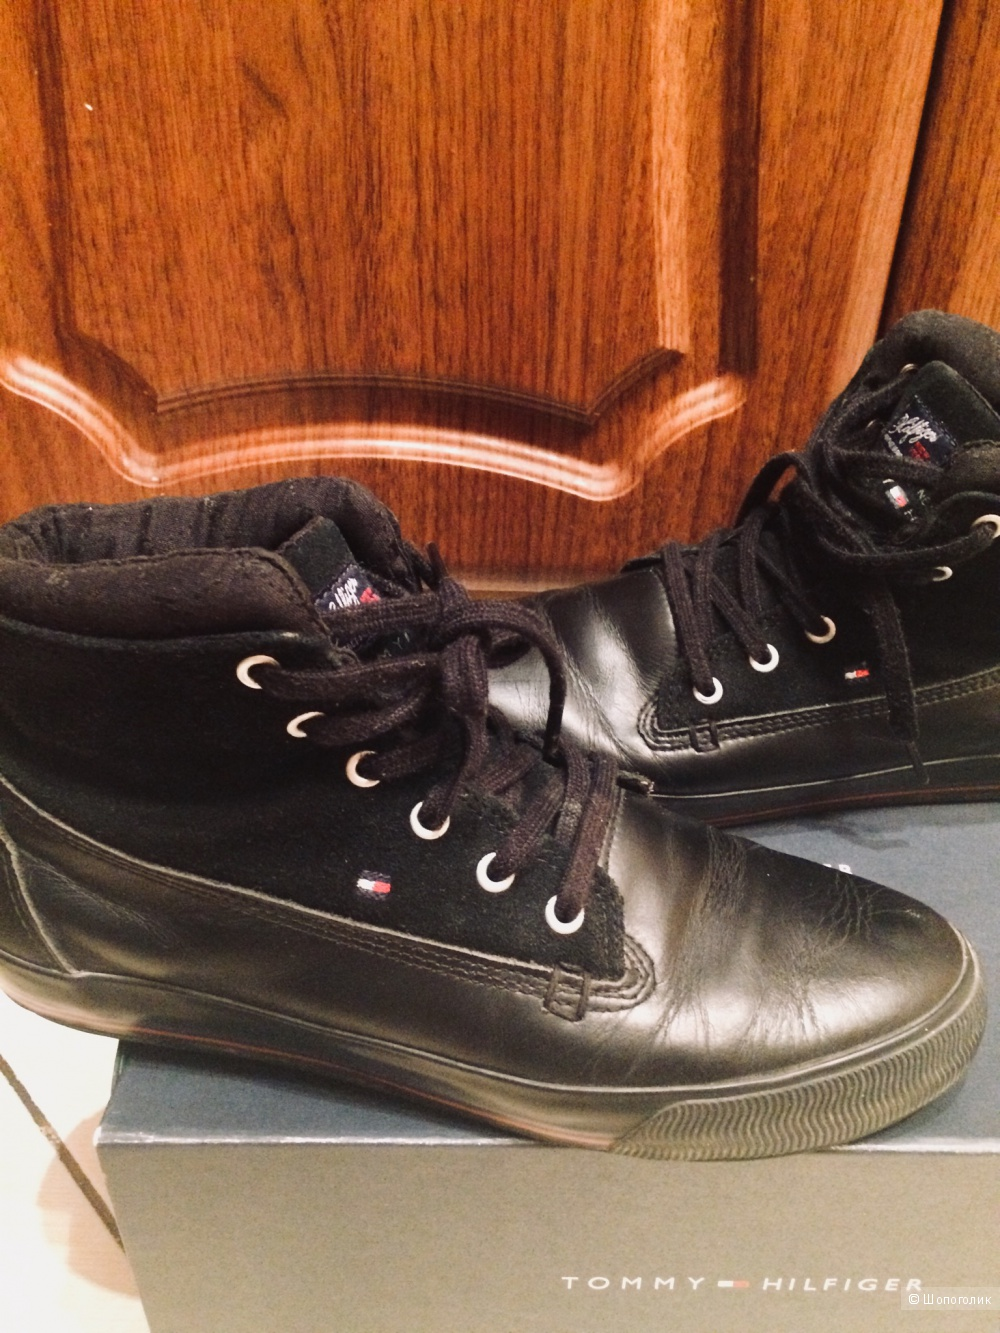 Ботинки Tommy Hilfiger, 38 размер.